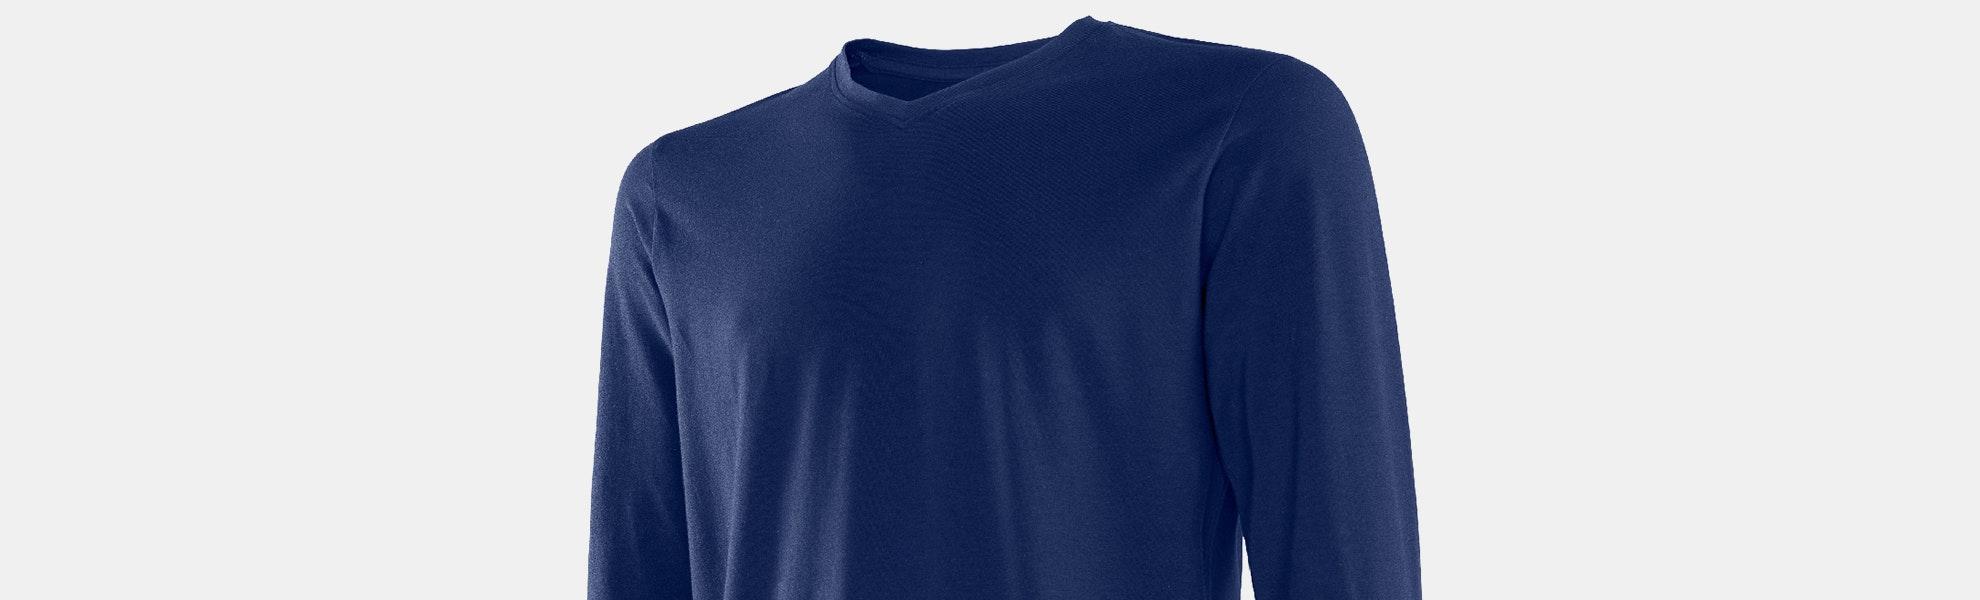 SAXX 3Six Five Long-Sleeve V-Neck T-Shirt